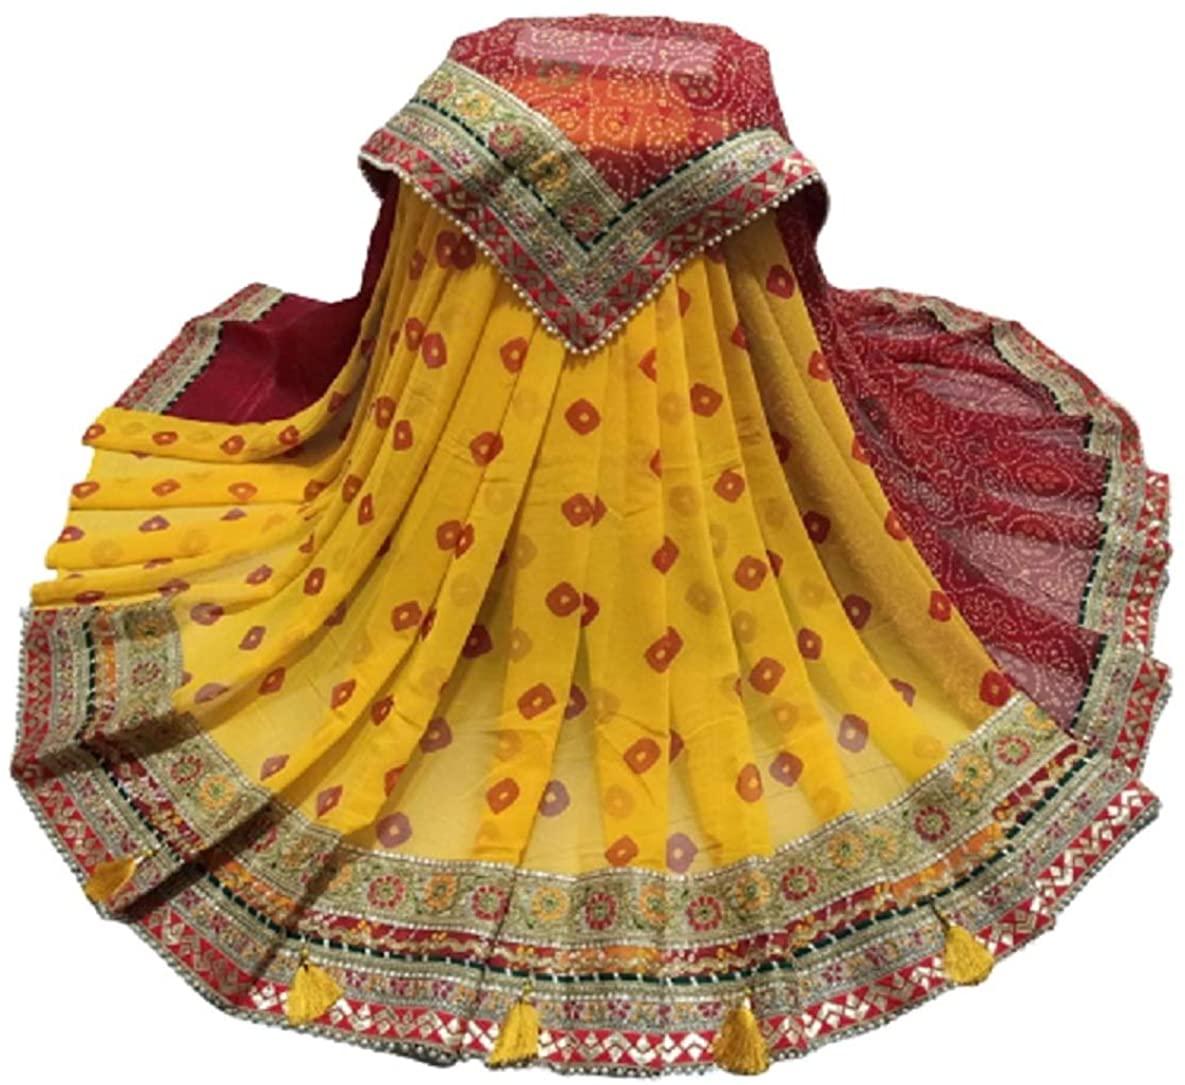 Indian Ethnic Bollywood Beautiful Designer Style Silk Cotton Style Sari Saree Moss Chiffon